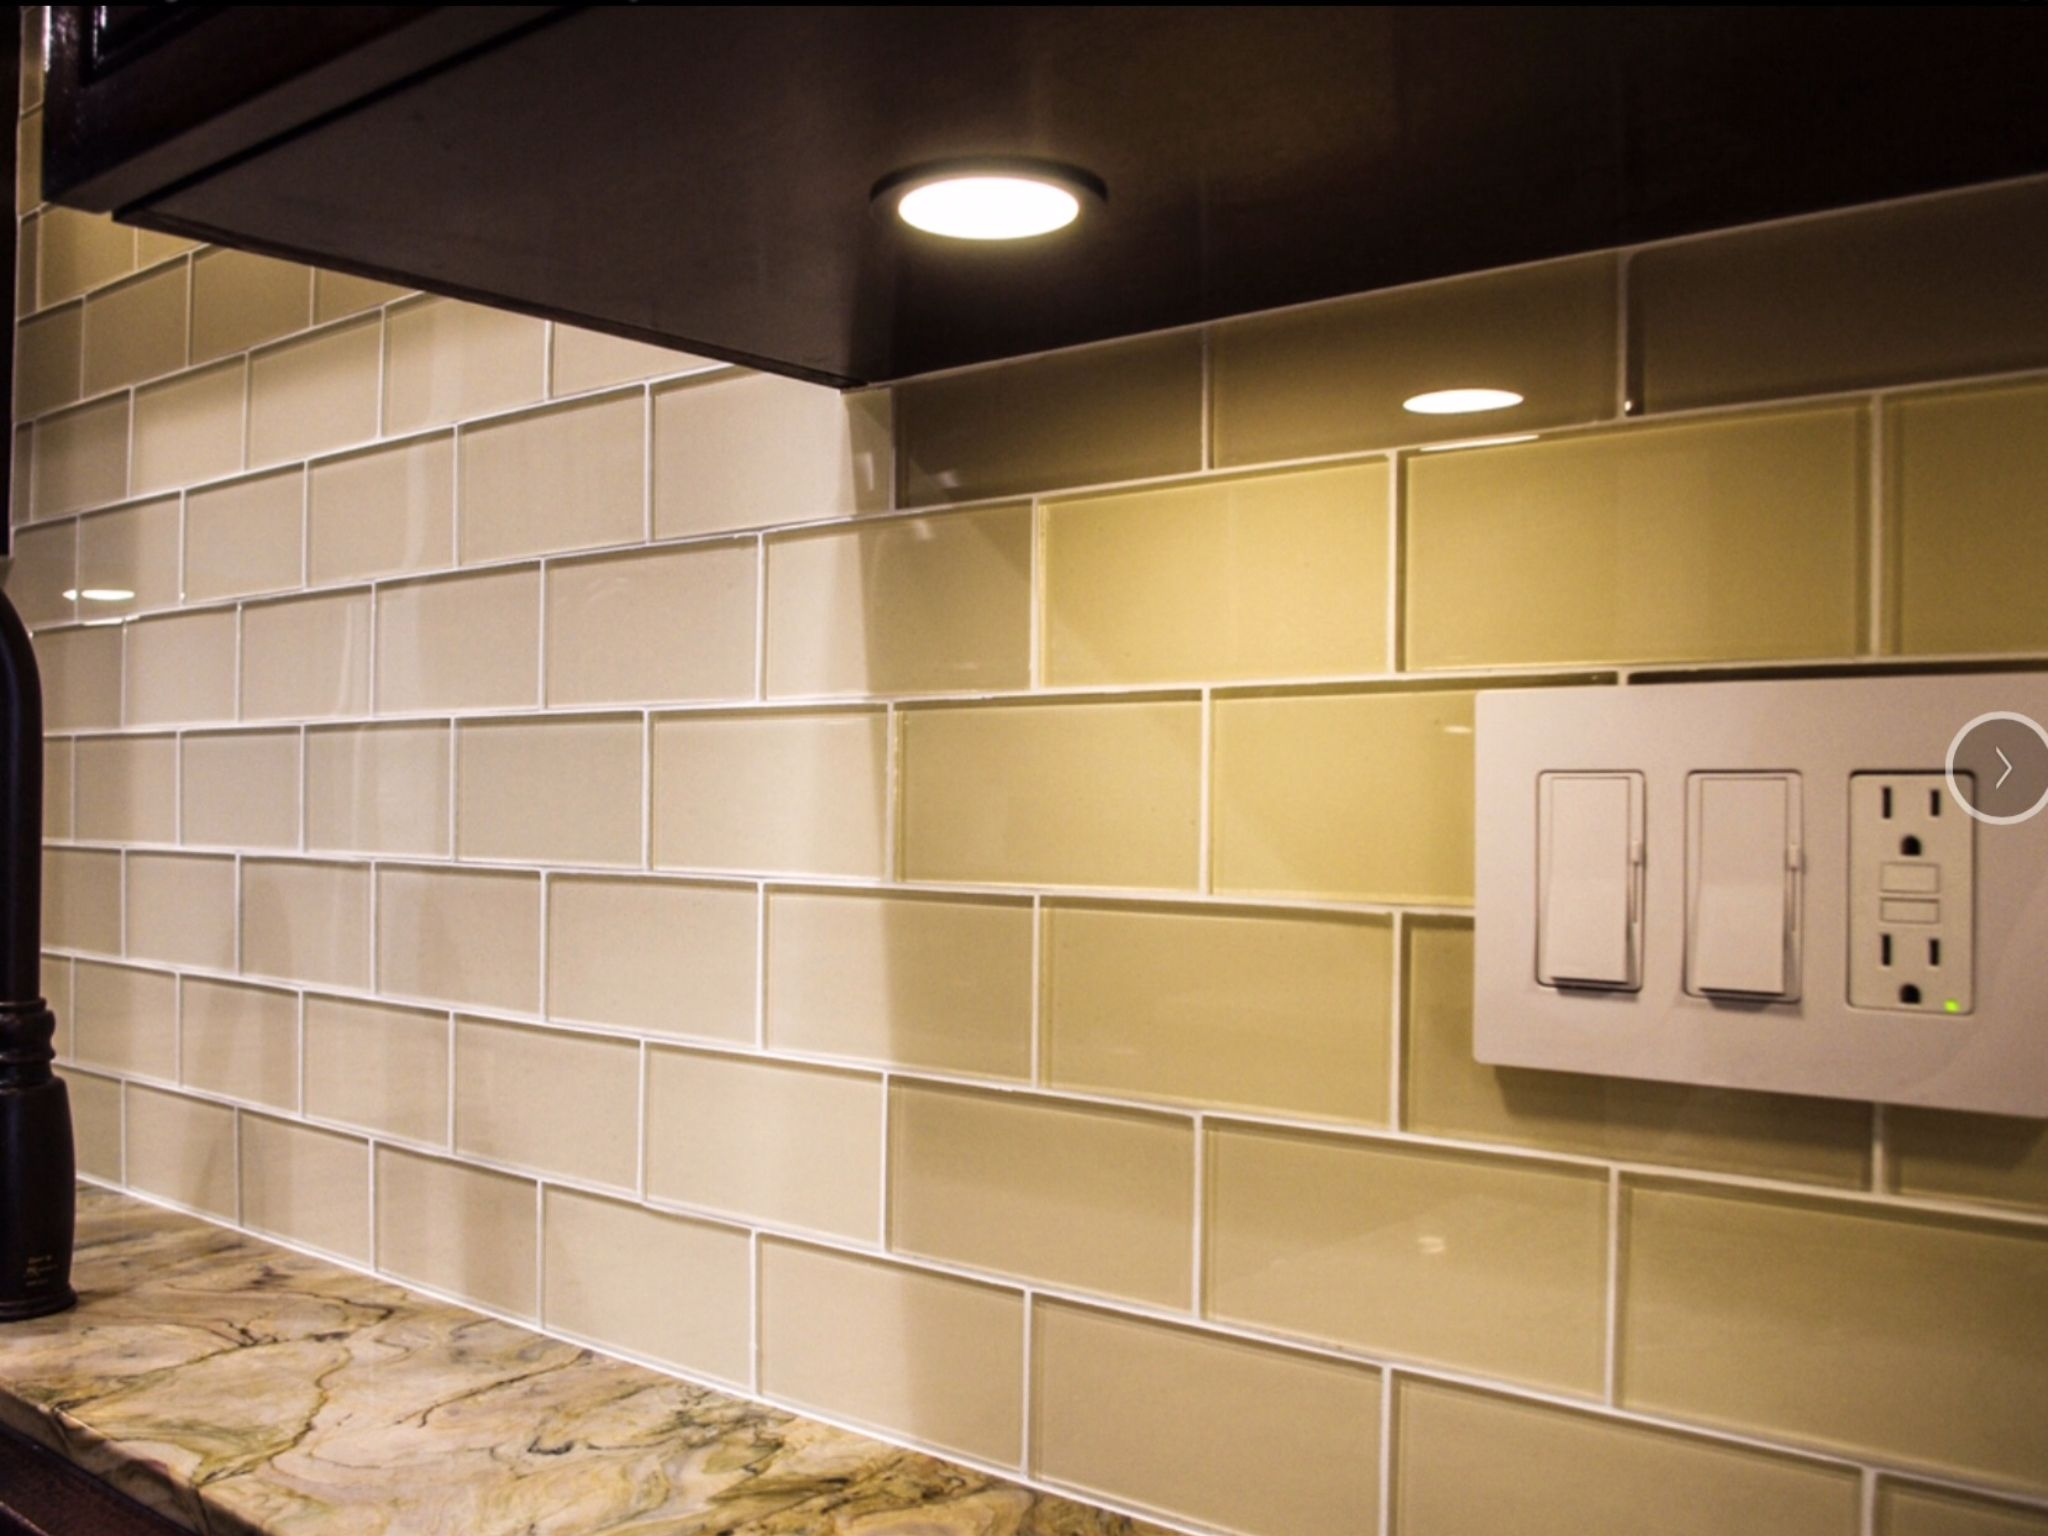 - Glass Subway Tile - Subway Tile Outlet